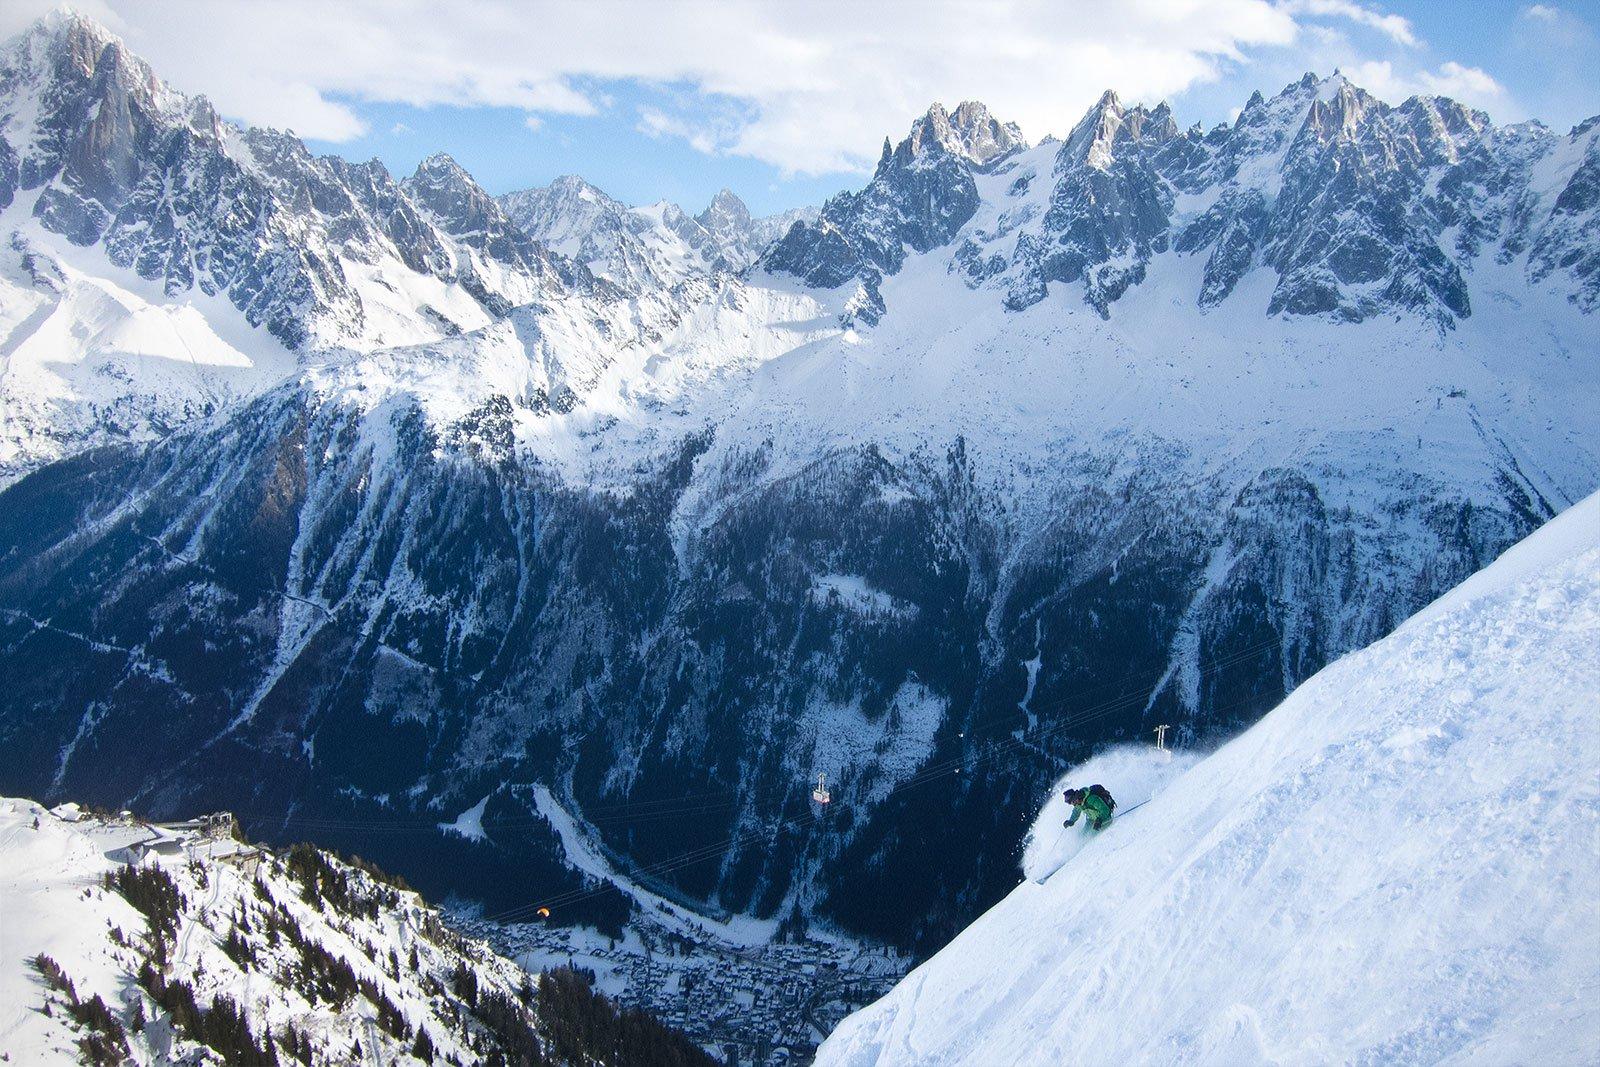 High above Chamonix